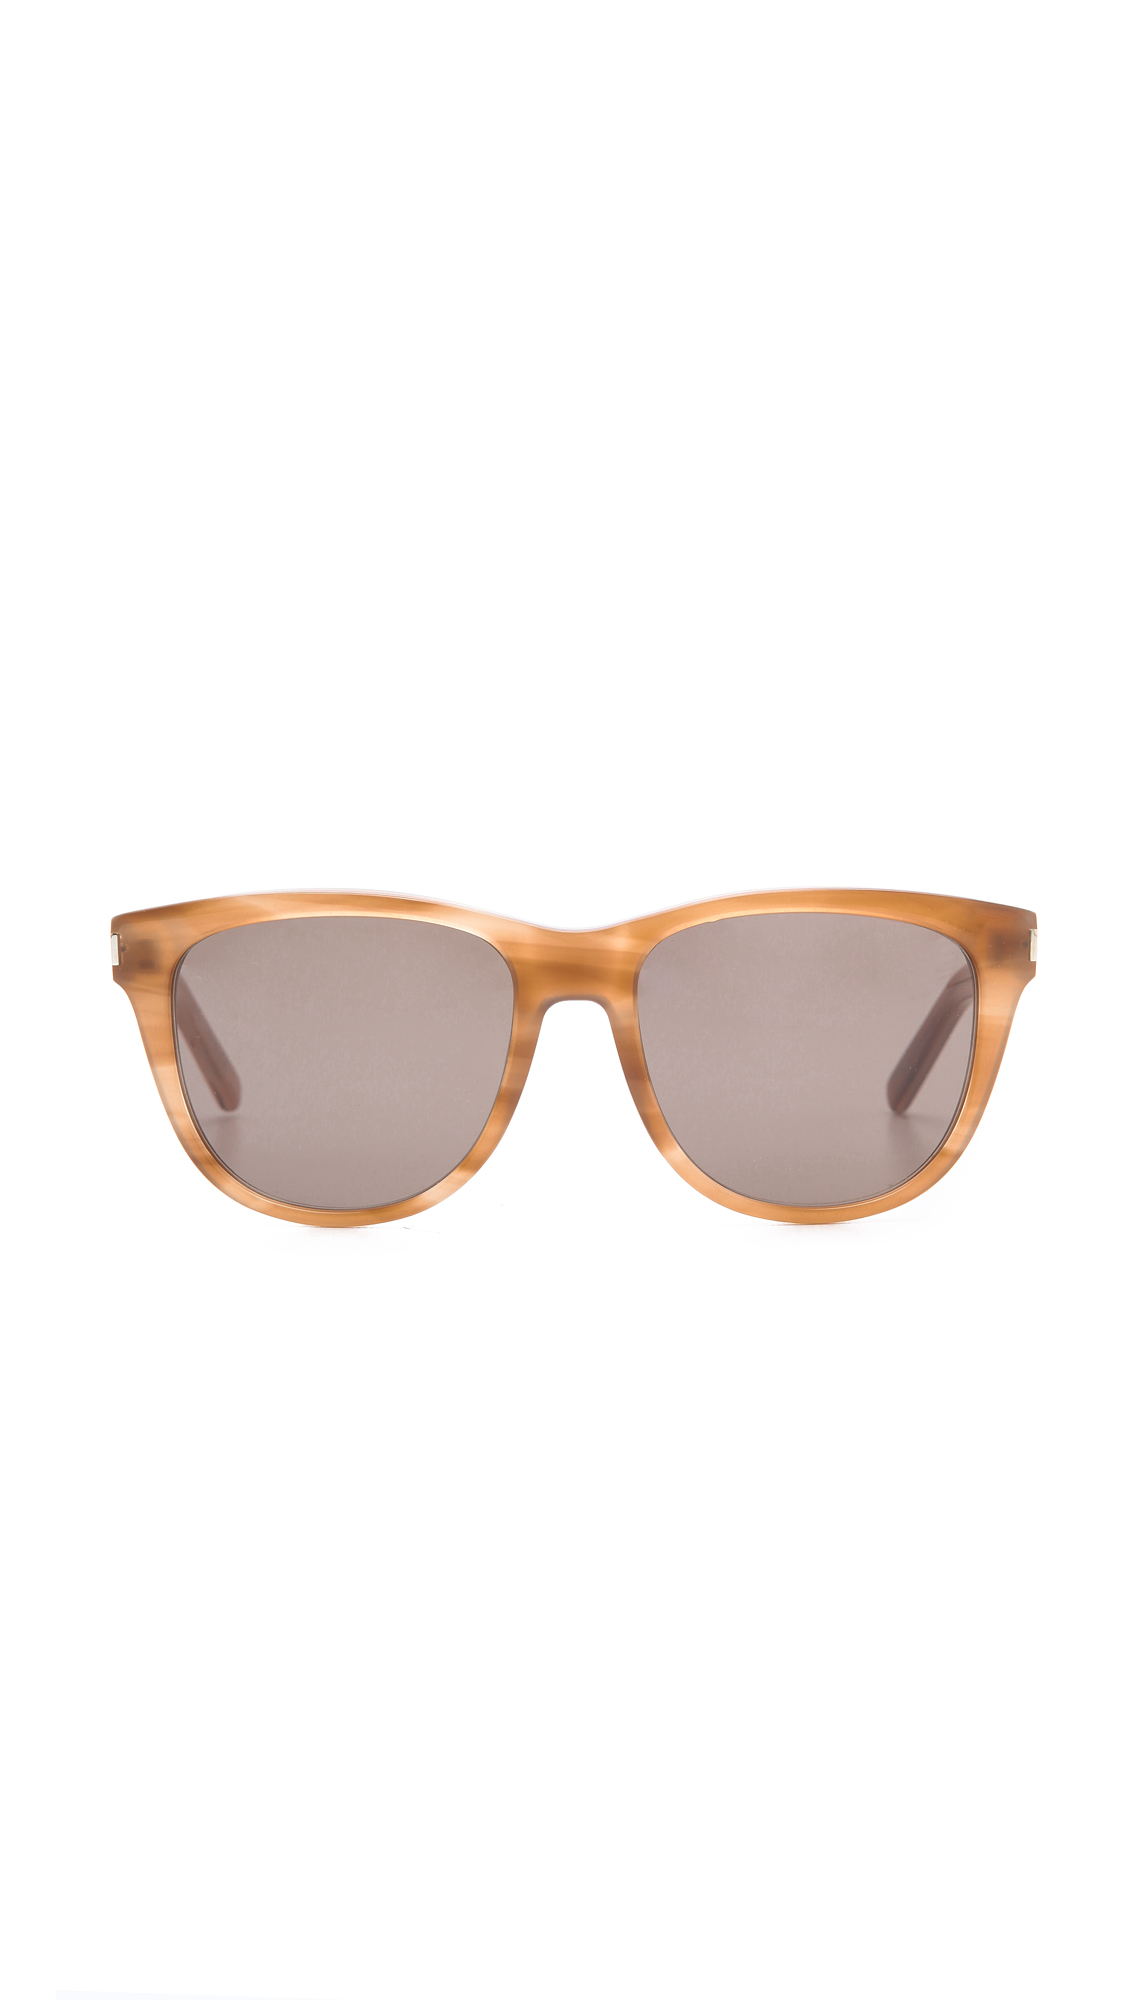 734f177f9da2 Lyst - Saint Laurent Classic Preppy Rounded Sunglasses - Honey brown ...